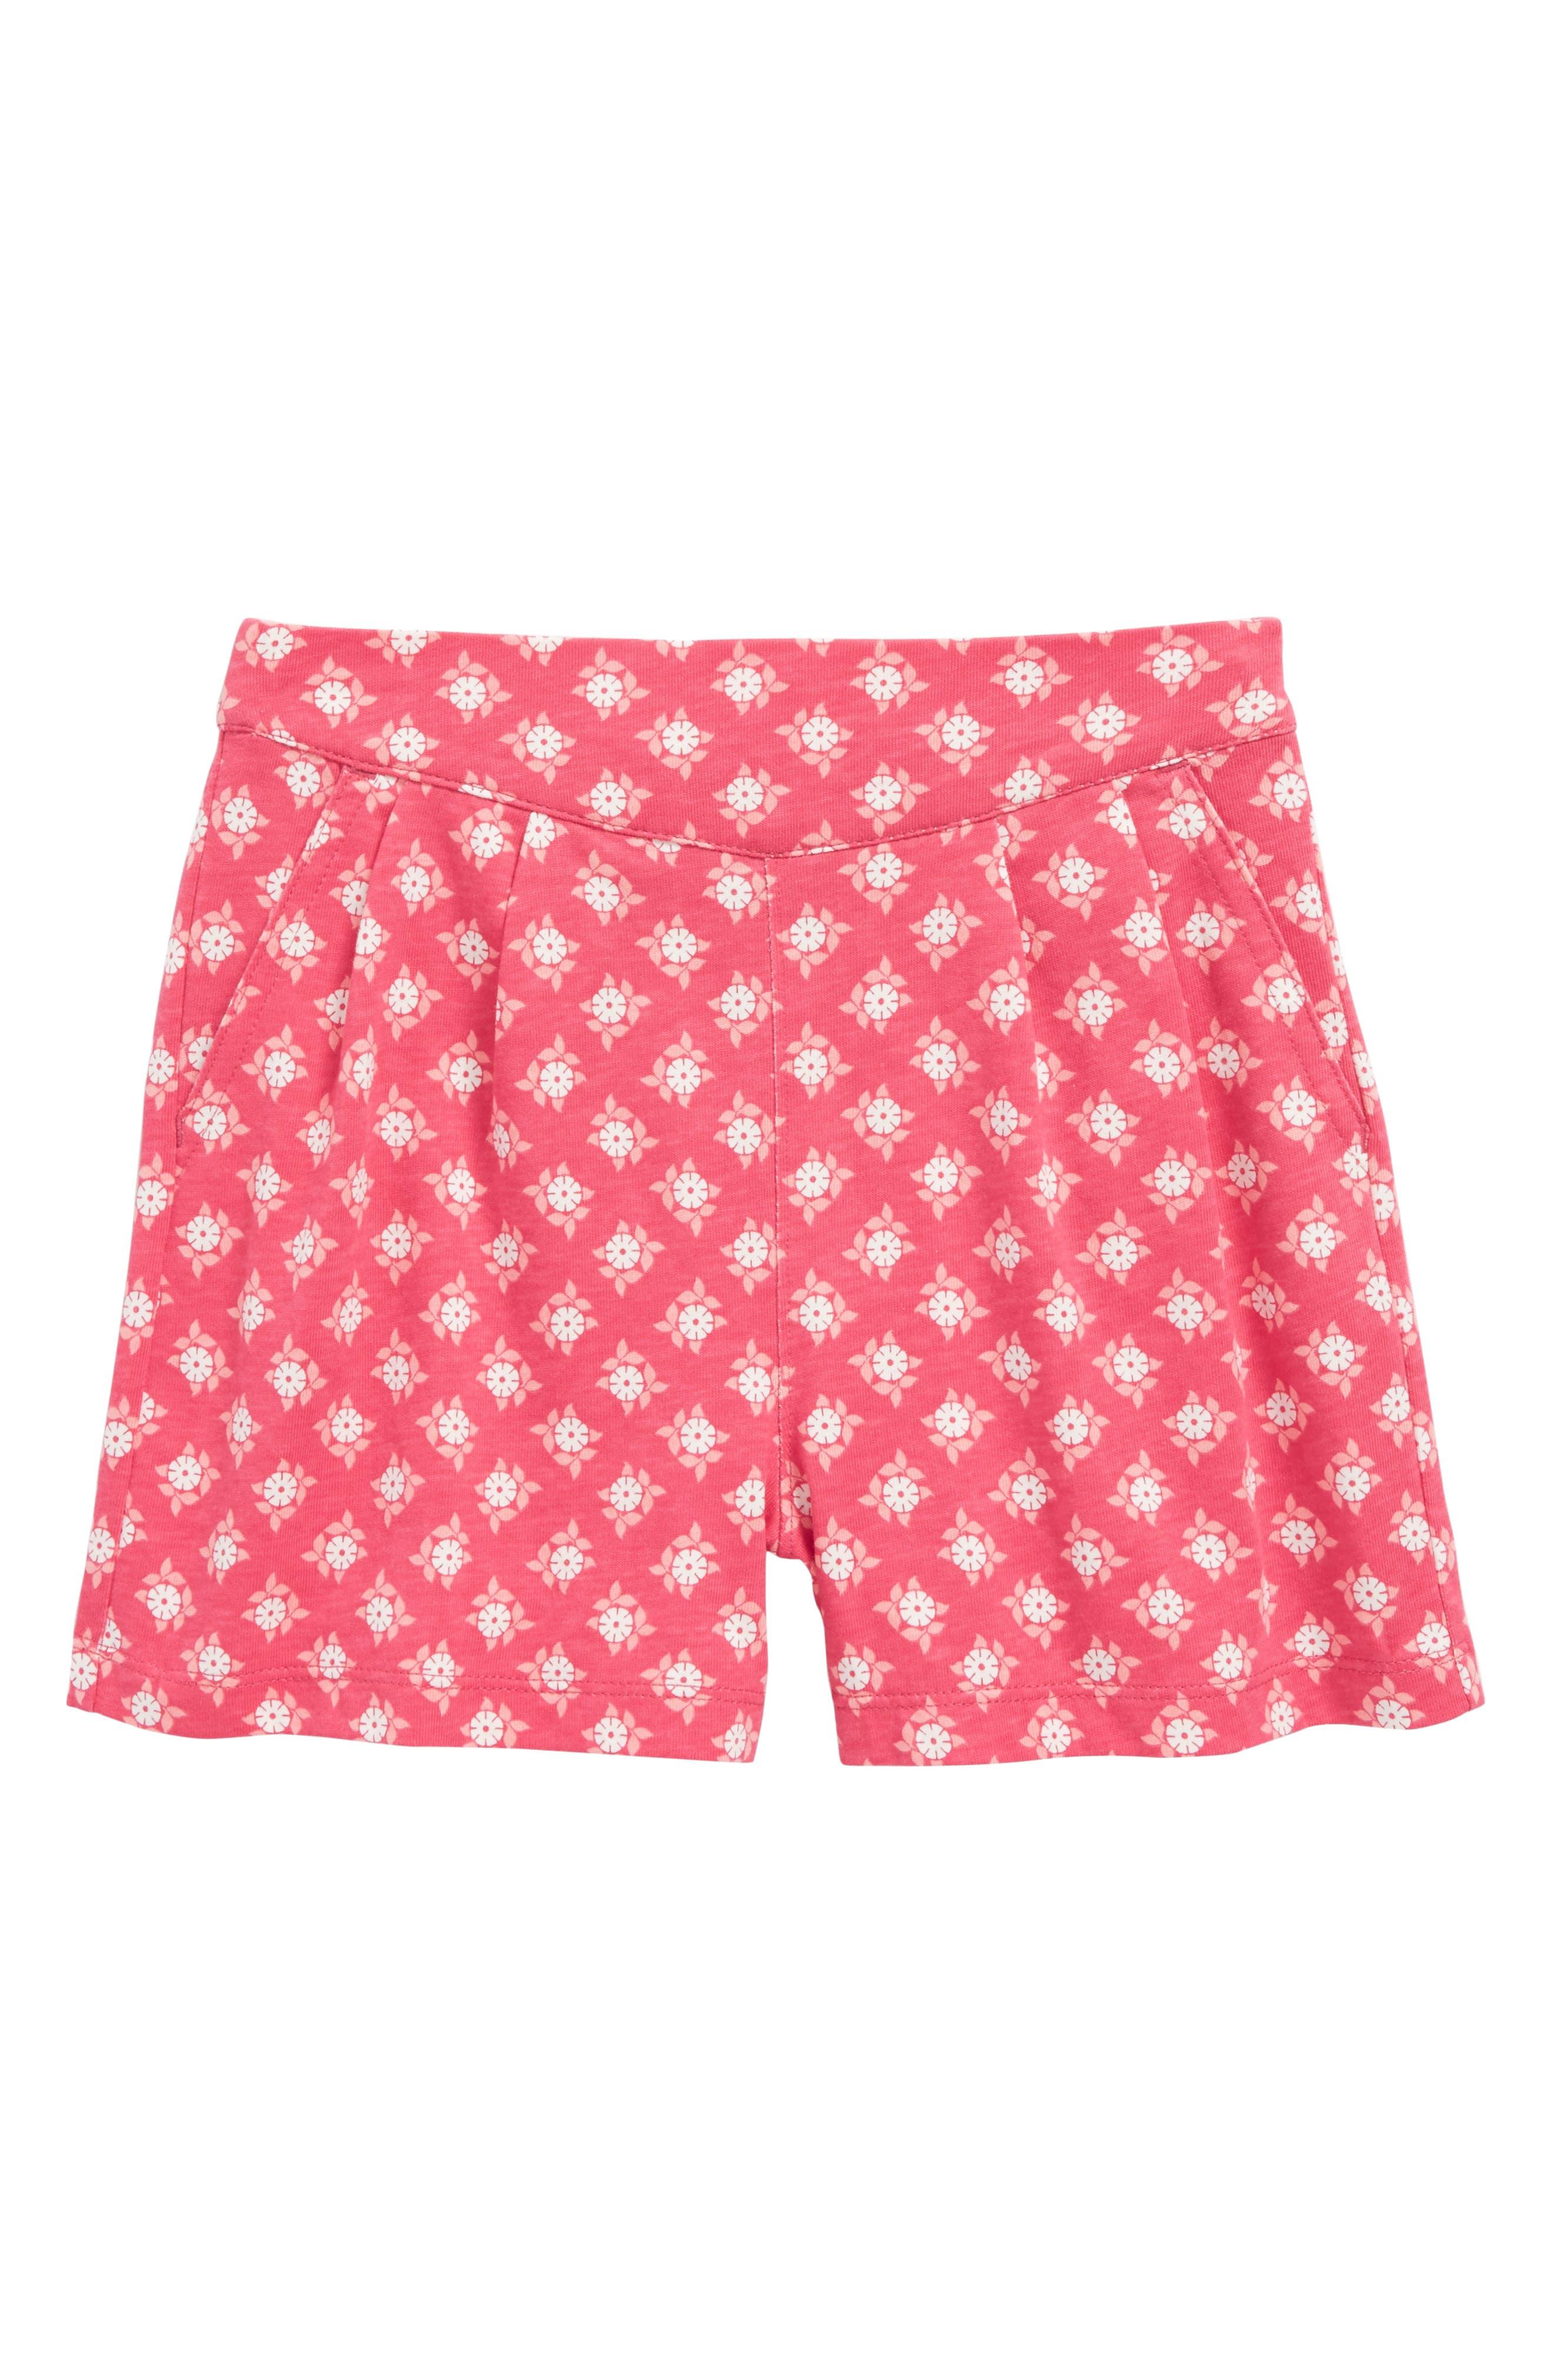 Tea Collection Sunburst Deck Shorts (Toddler Girls, Little Girls & Big Girls)